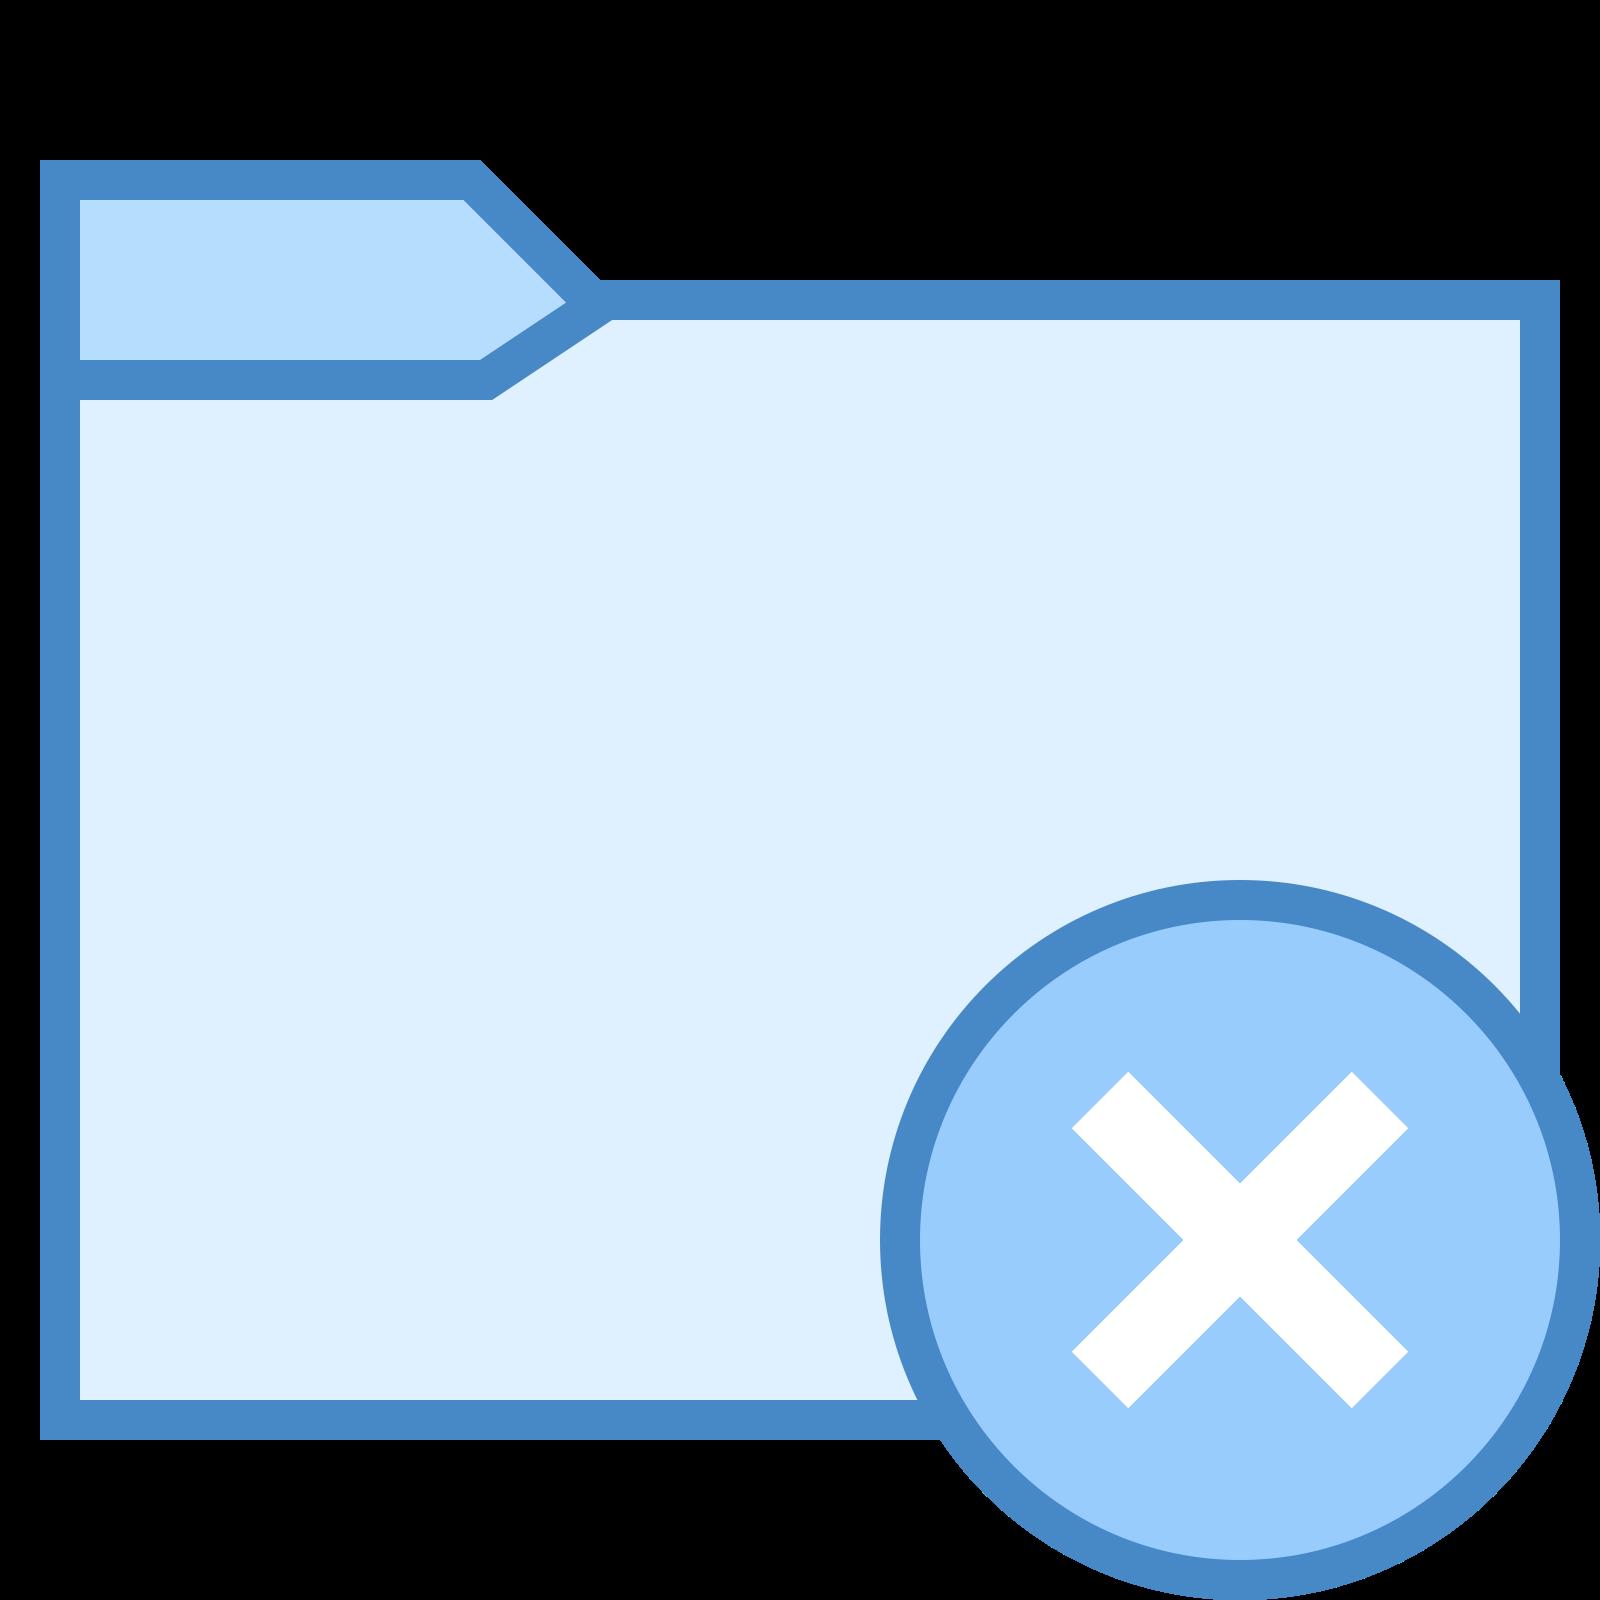 Usunięty folder icon